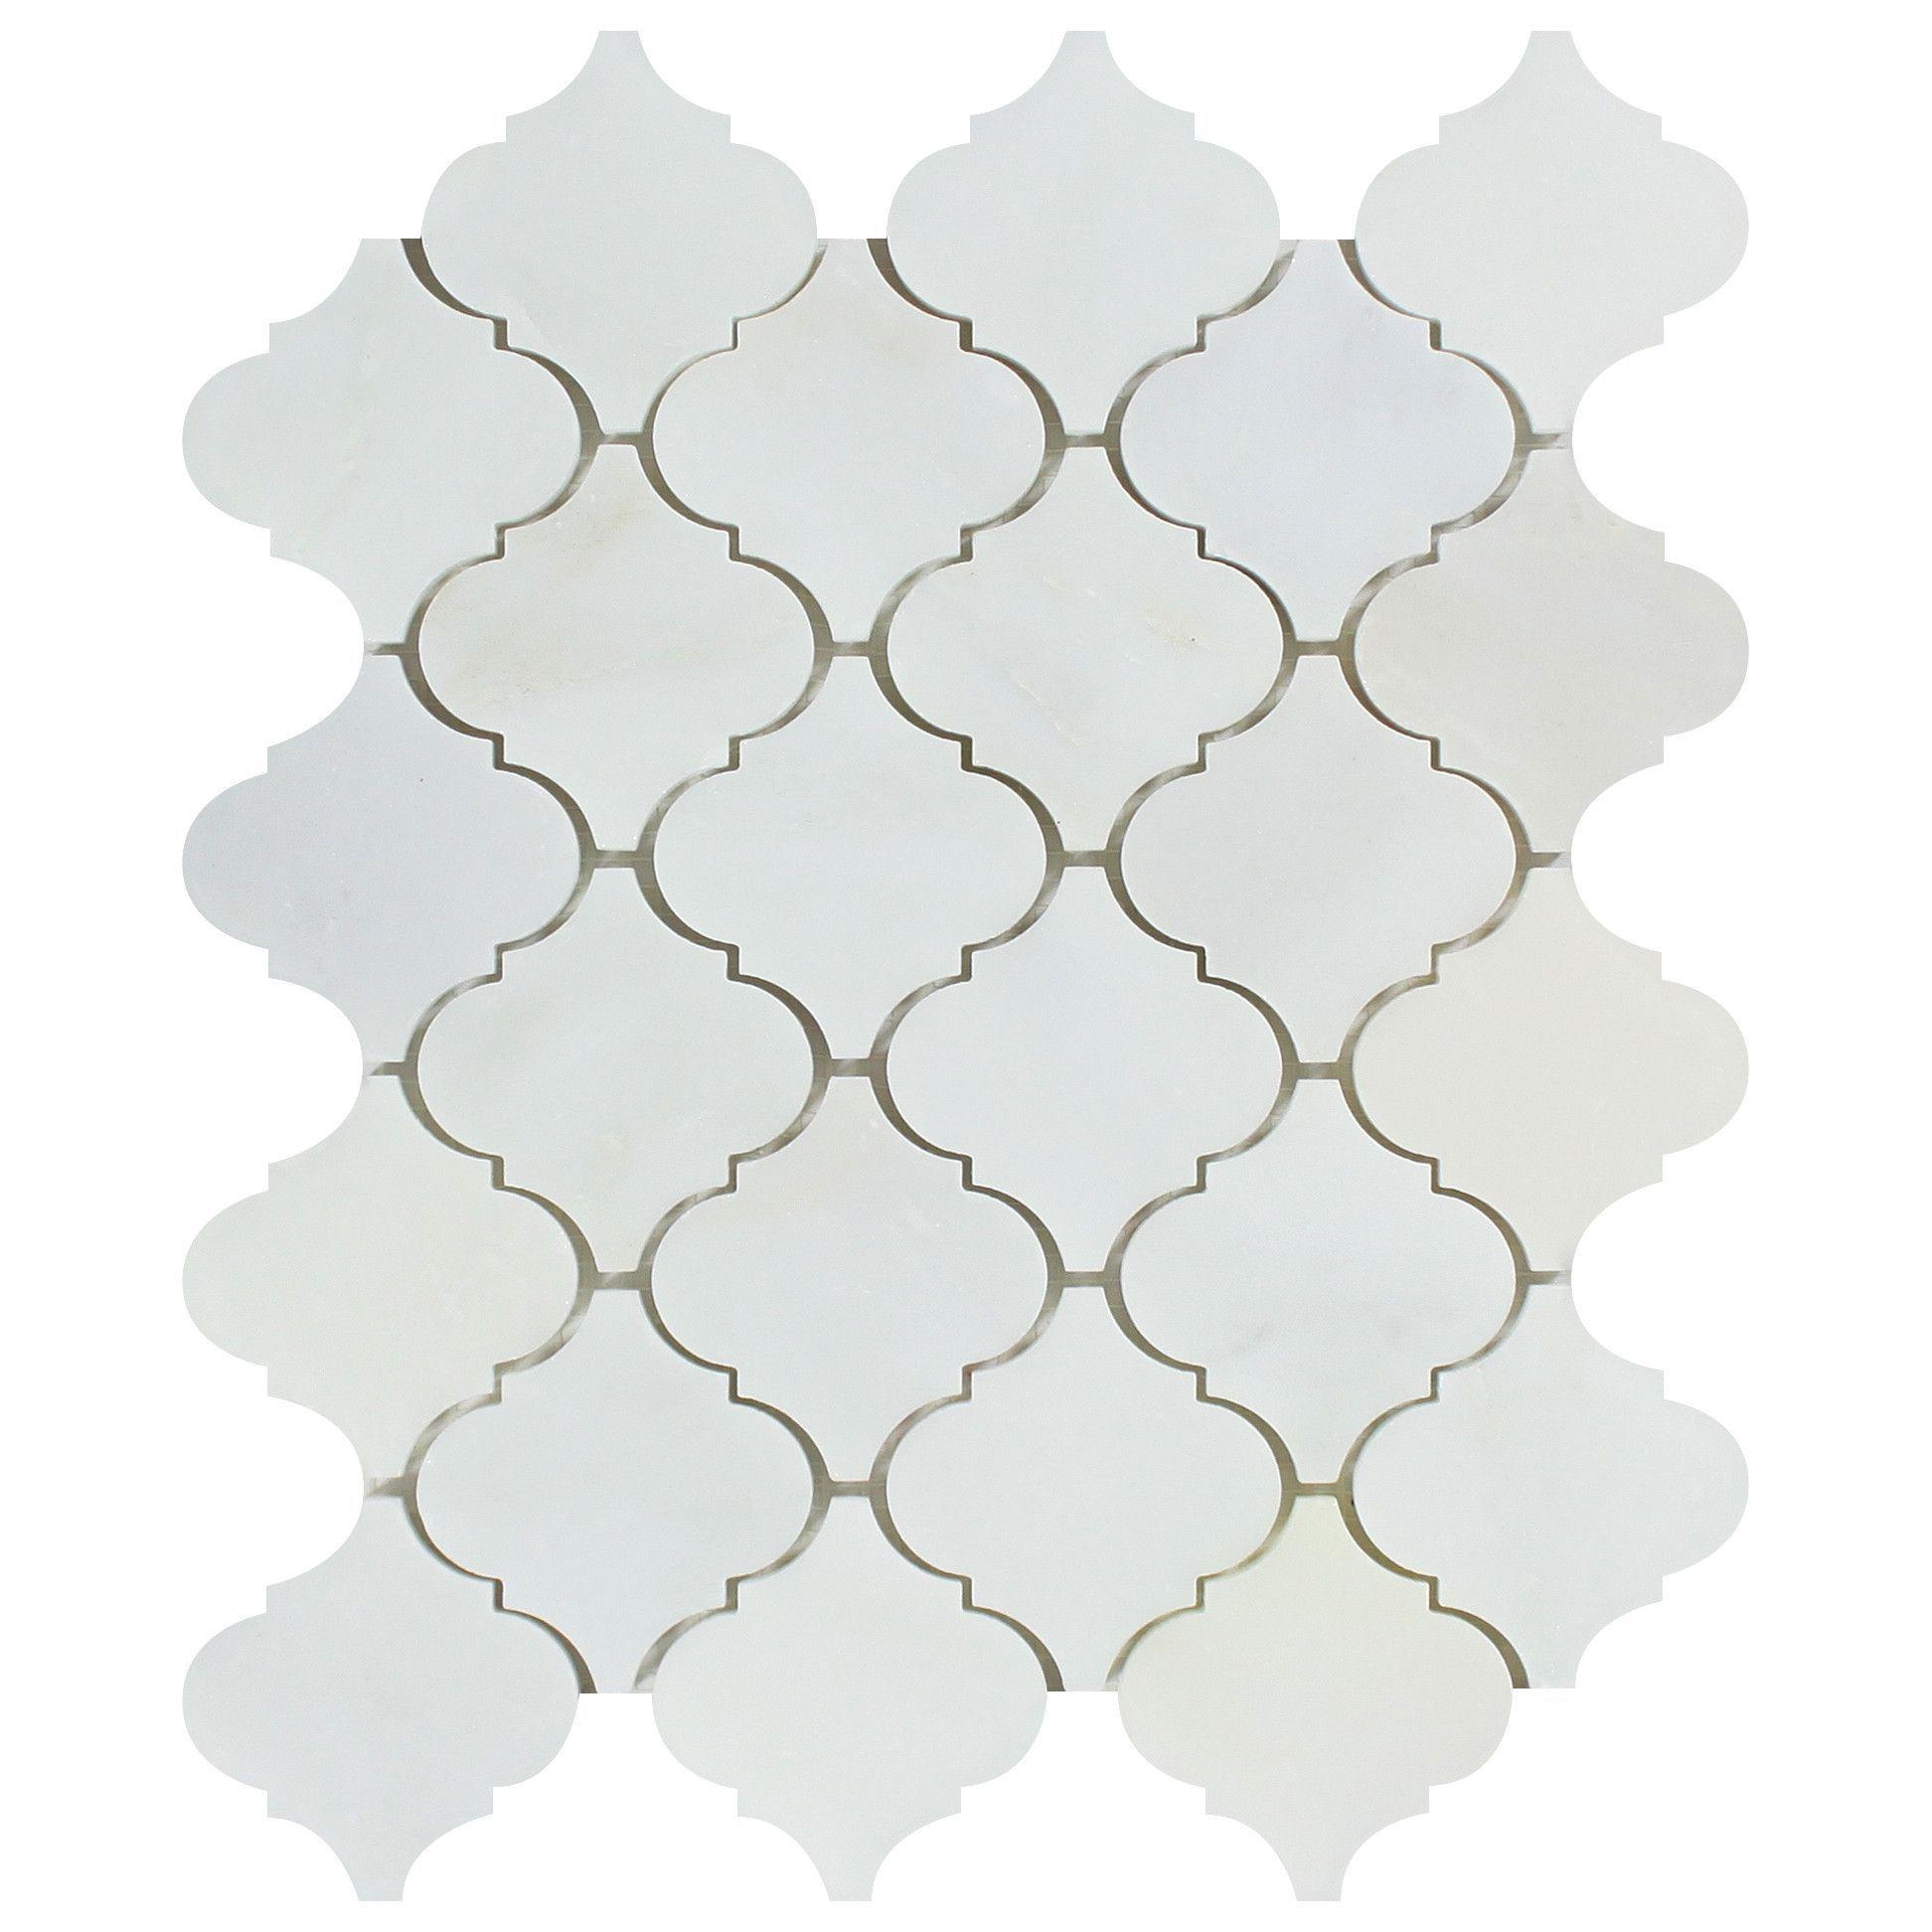 Oriental White Asian Statuary Marble Polished Lantern Arabesque Mosaic Tile Arabesque Mosaic Tiles Mosaic Tiles Mosaic